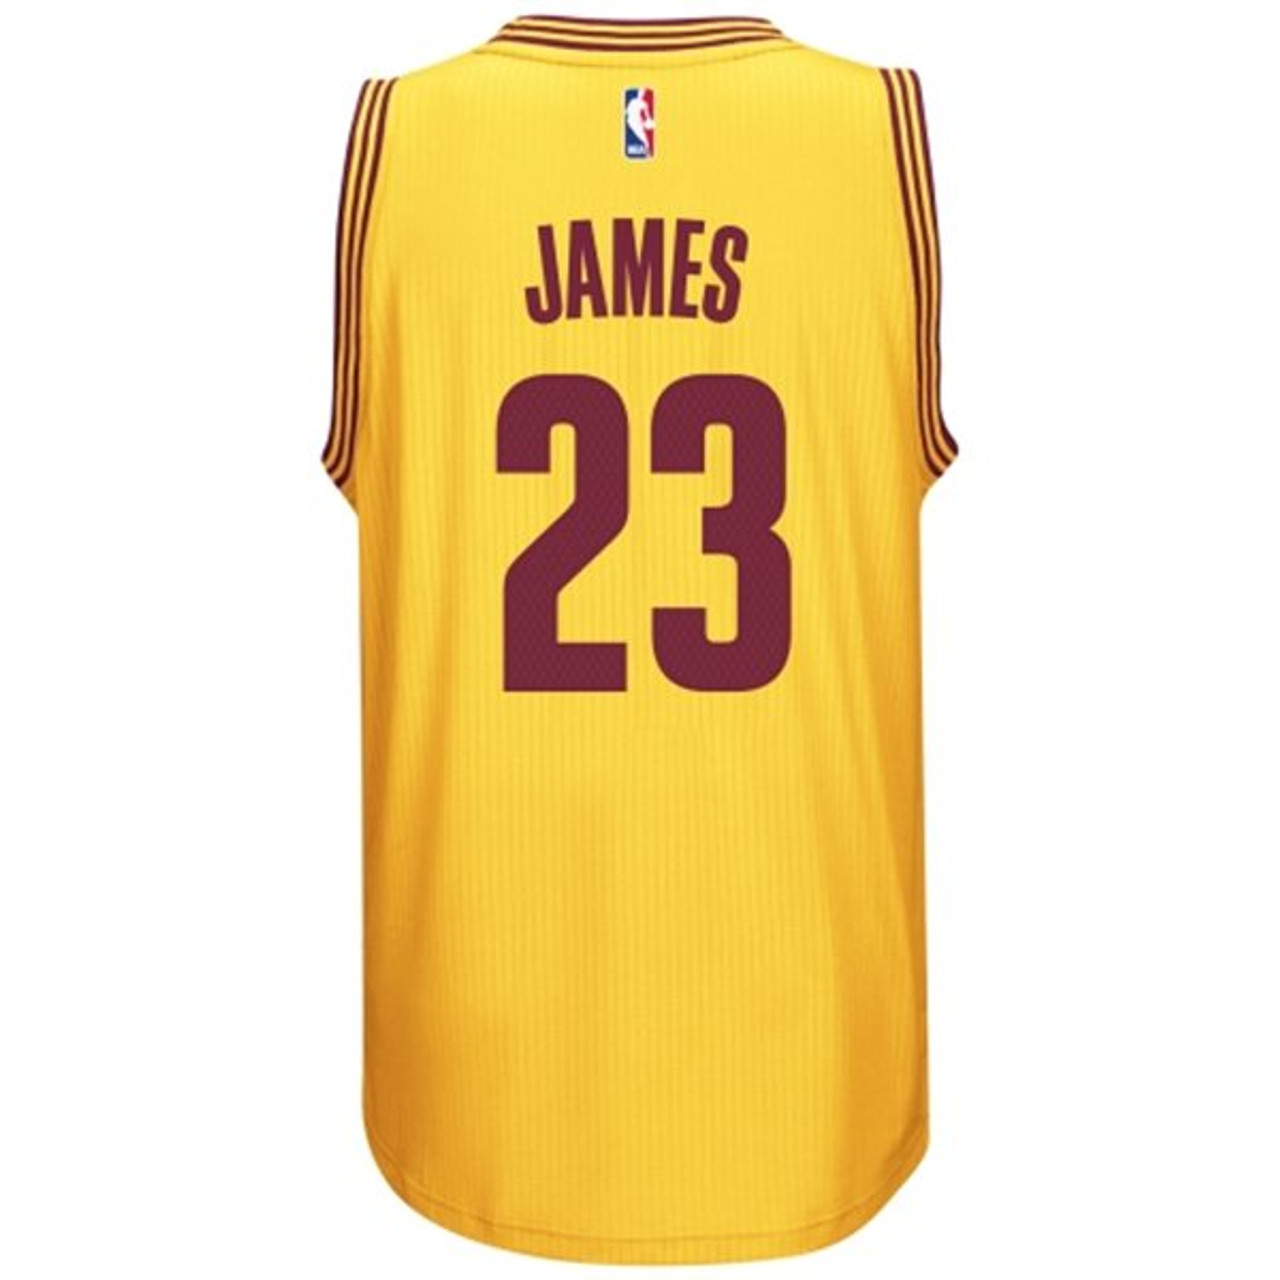 best website 4e1c1 1e5cc Cleveland Cavaliers - LeBron James - Gold Alternate ...